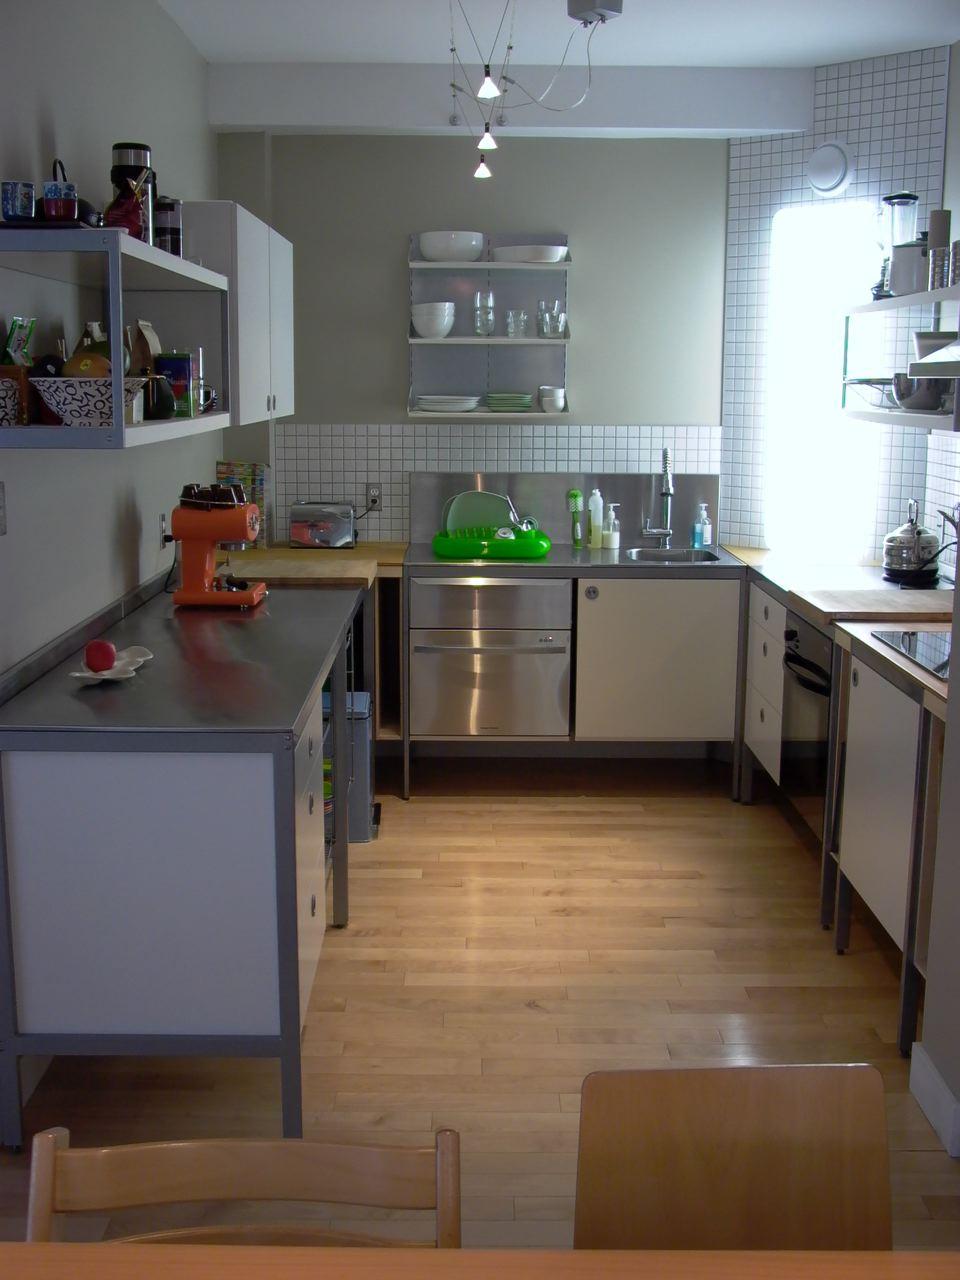 kuchnia ikea udden najlepszy pomys na projekt kuchni w tym roku. Black Bedroom Furniture Sets. Home Design Ideas